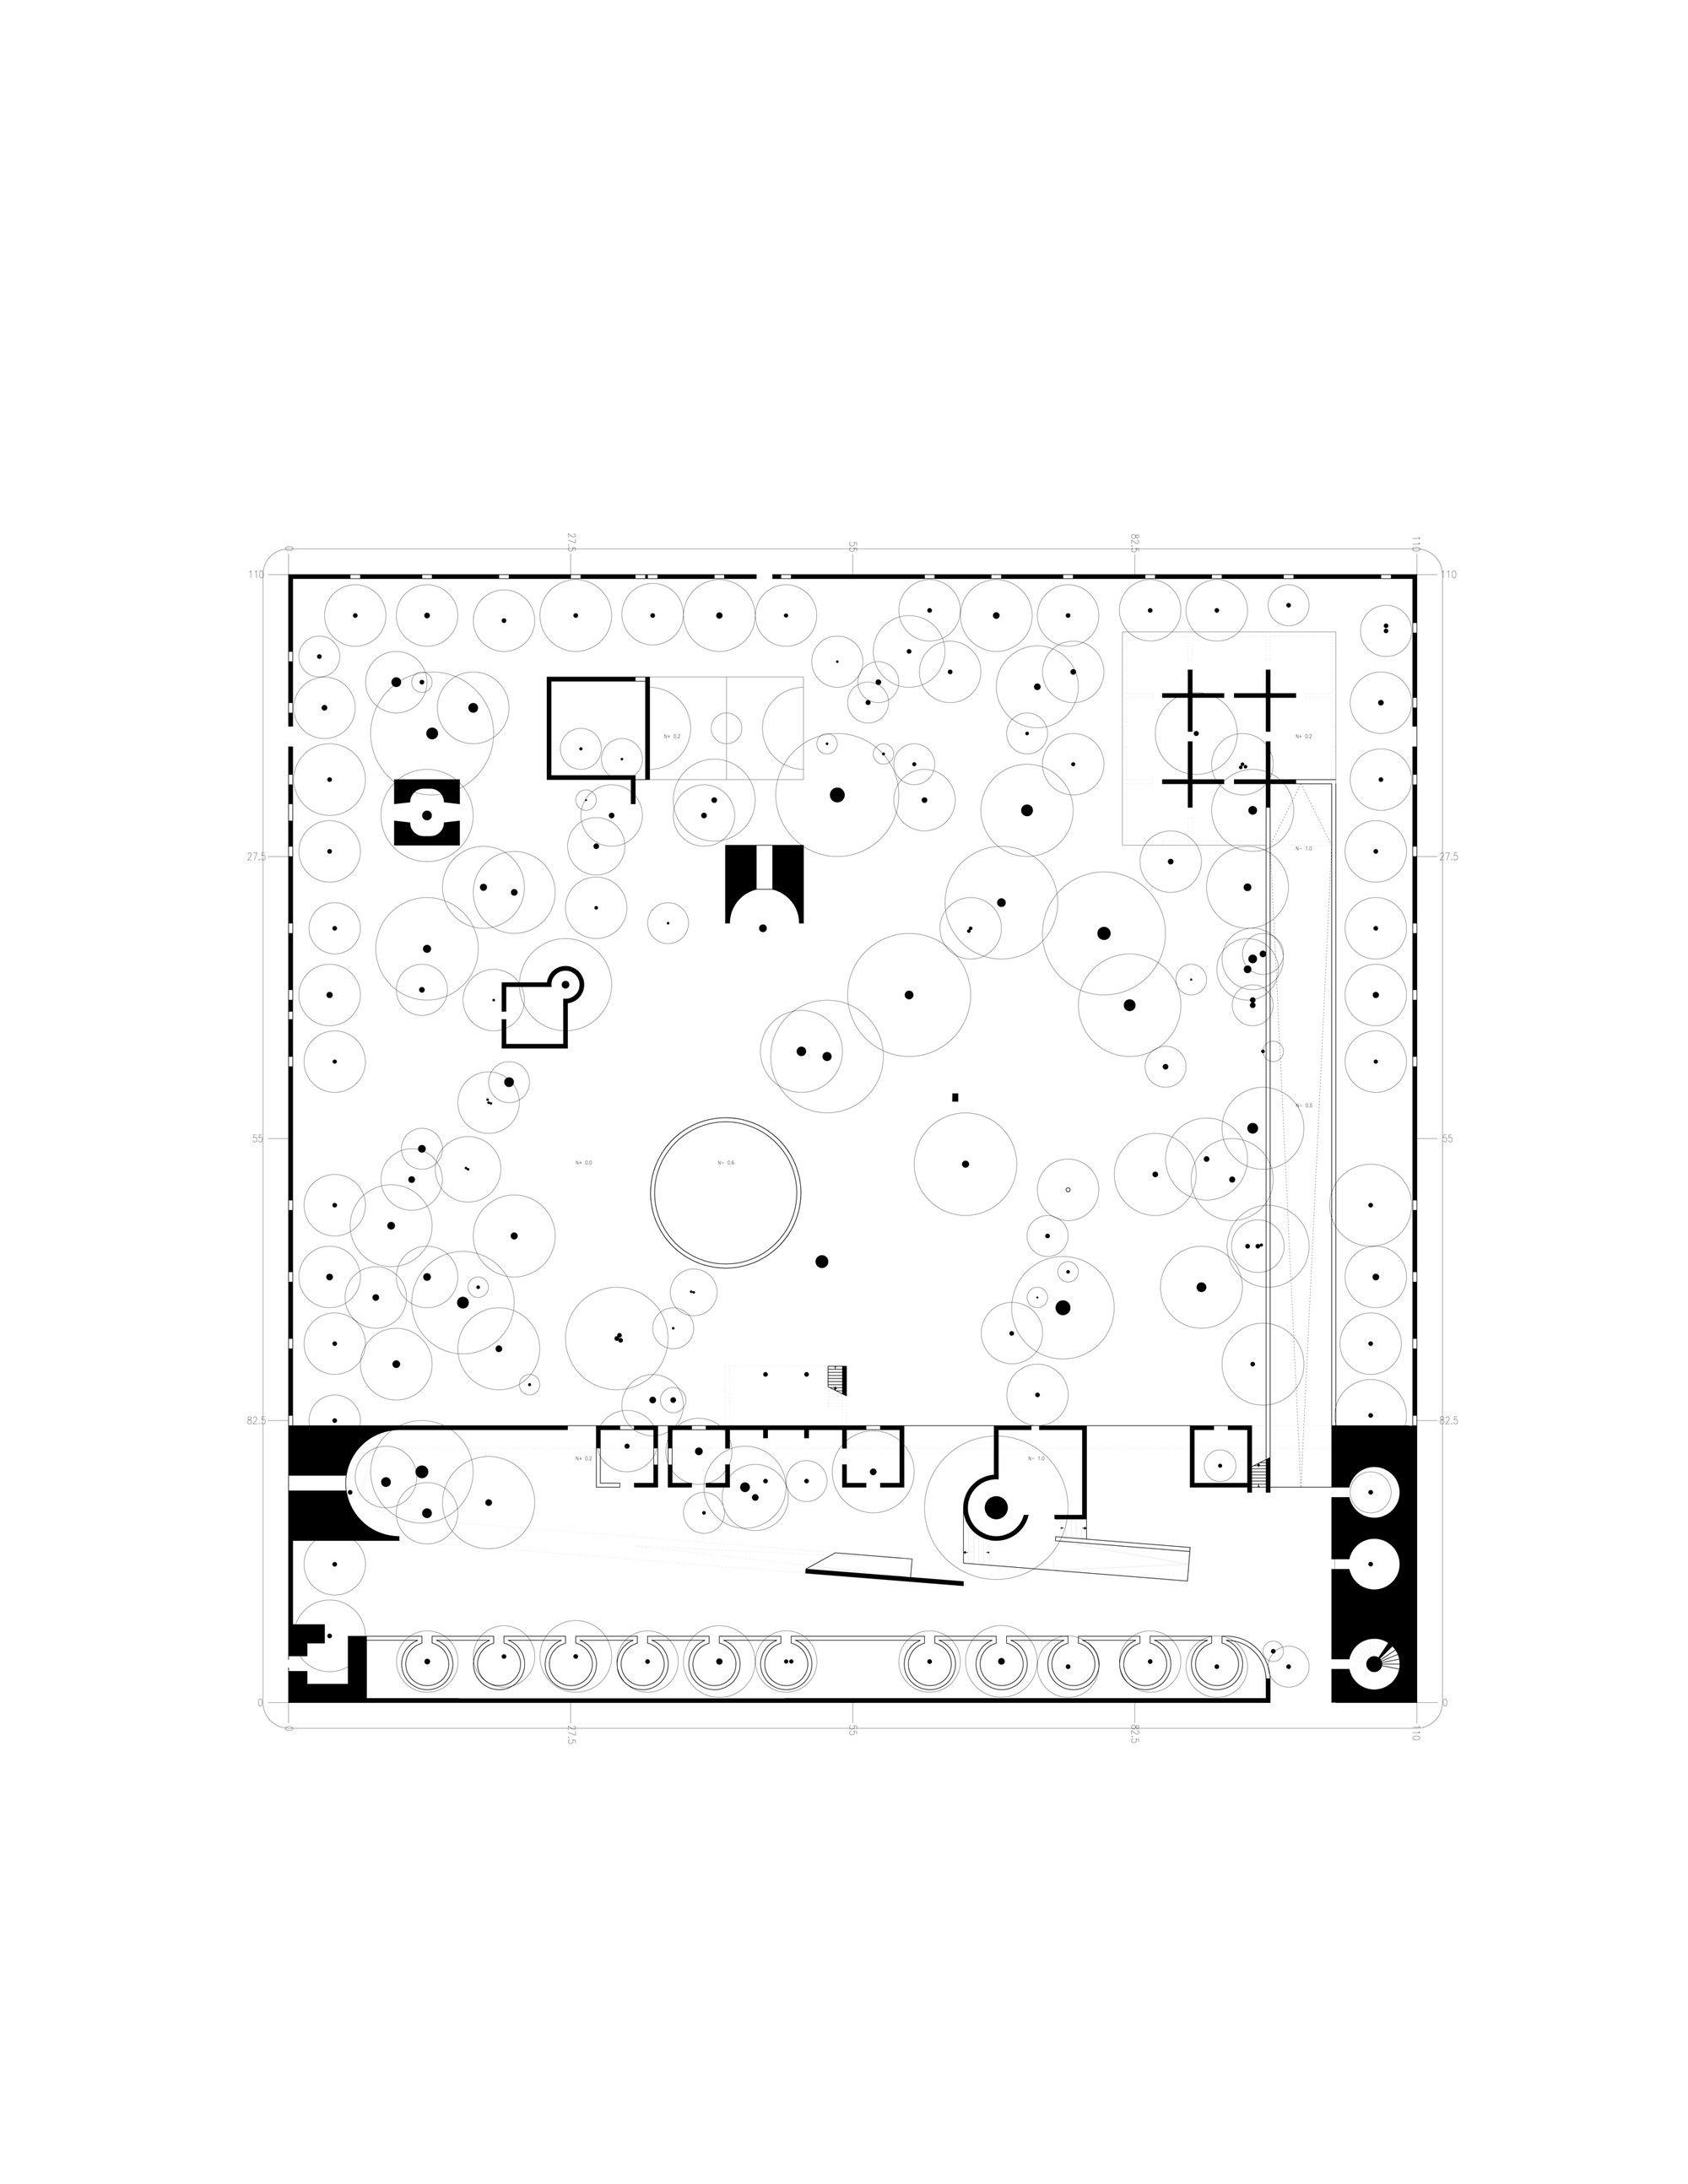 Galeria De Pezo Von Ellrichshausen Dicta Taller De Proyectos En